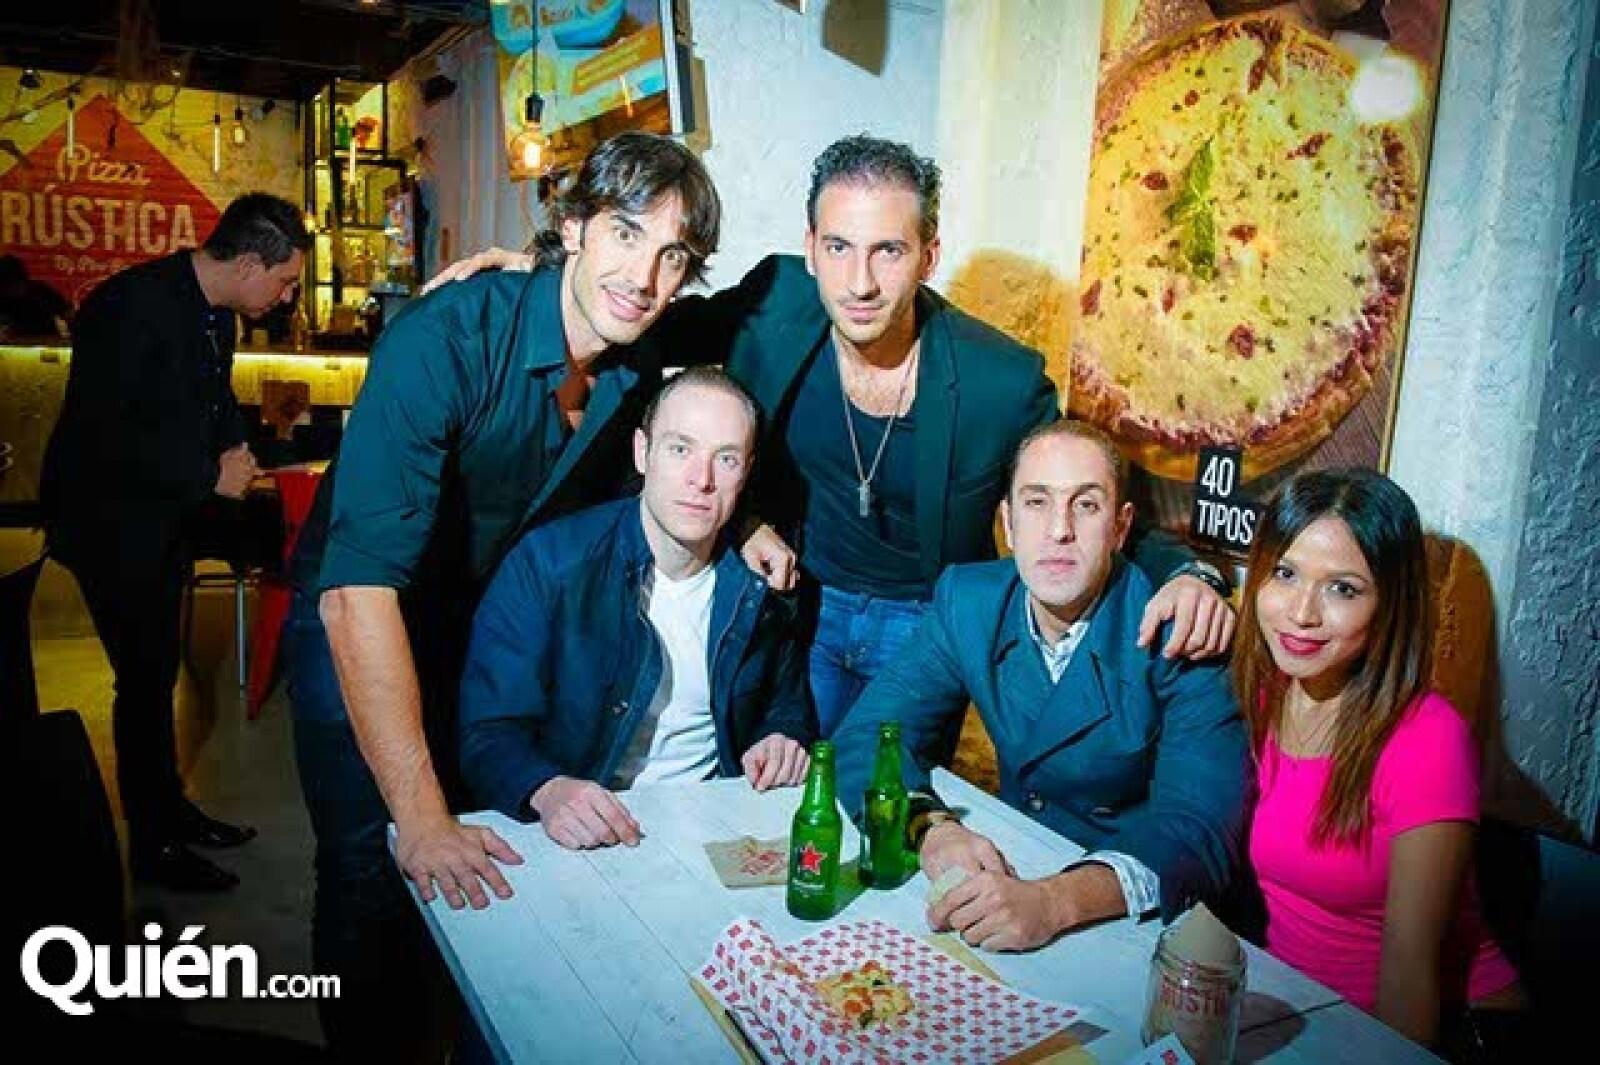 Pedro Prieto,Luis Trabulse,Pepe Trabulse,Johnny Abraham y Liliana Boneti